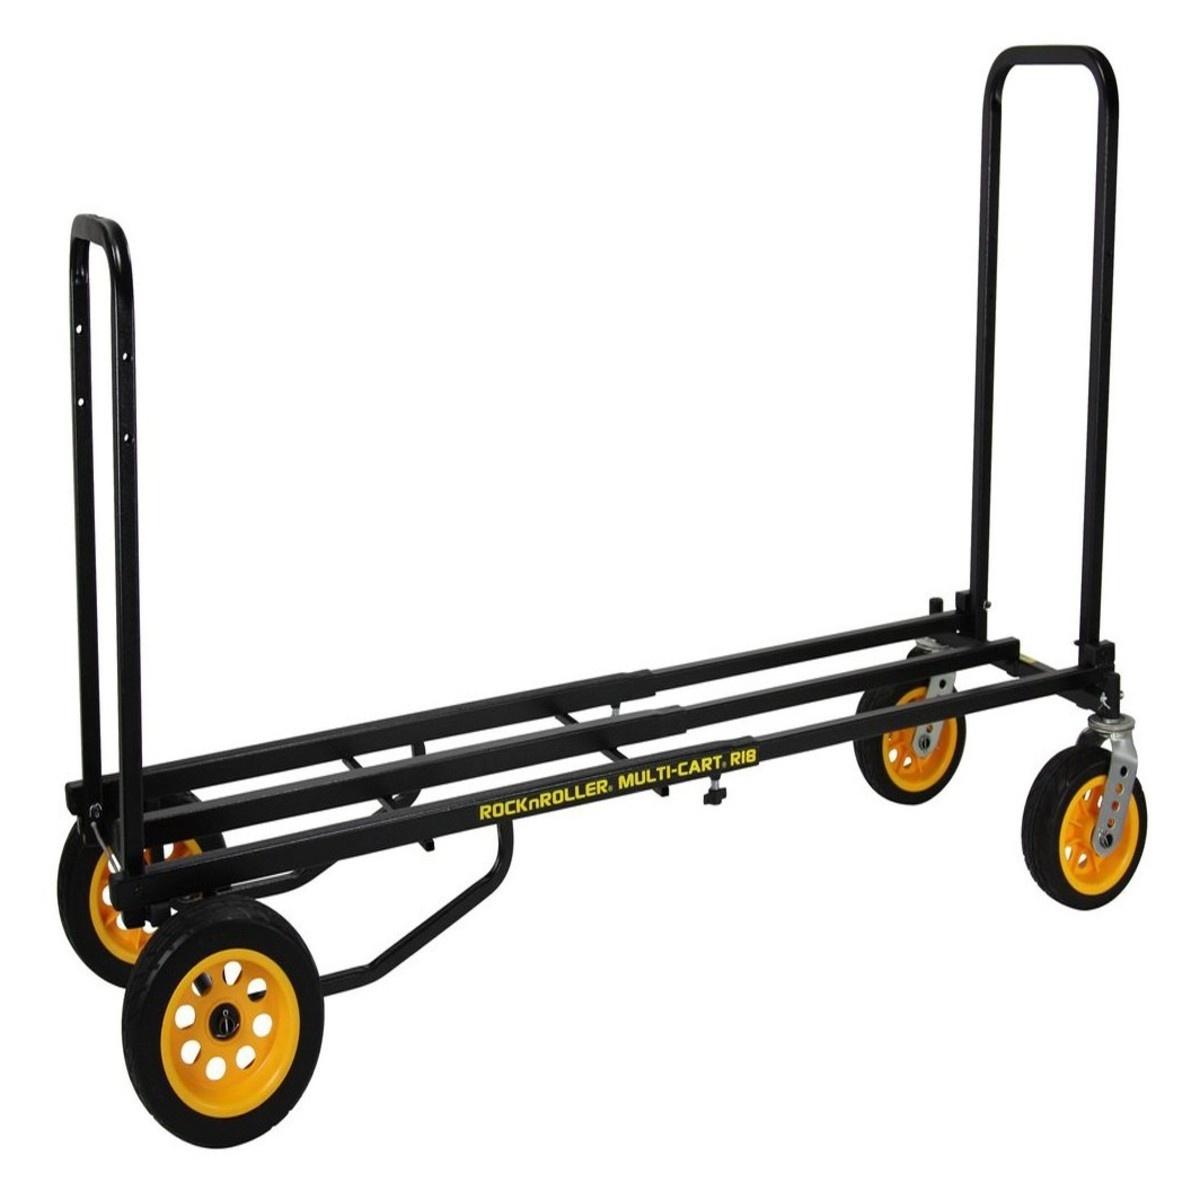 "Rock N Roller Rock N Roller MultiCart R18 ""Ground Glider Mega"", 700lb Capacity"